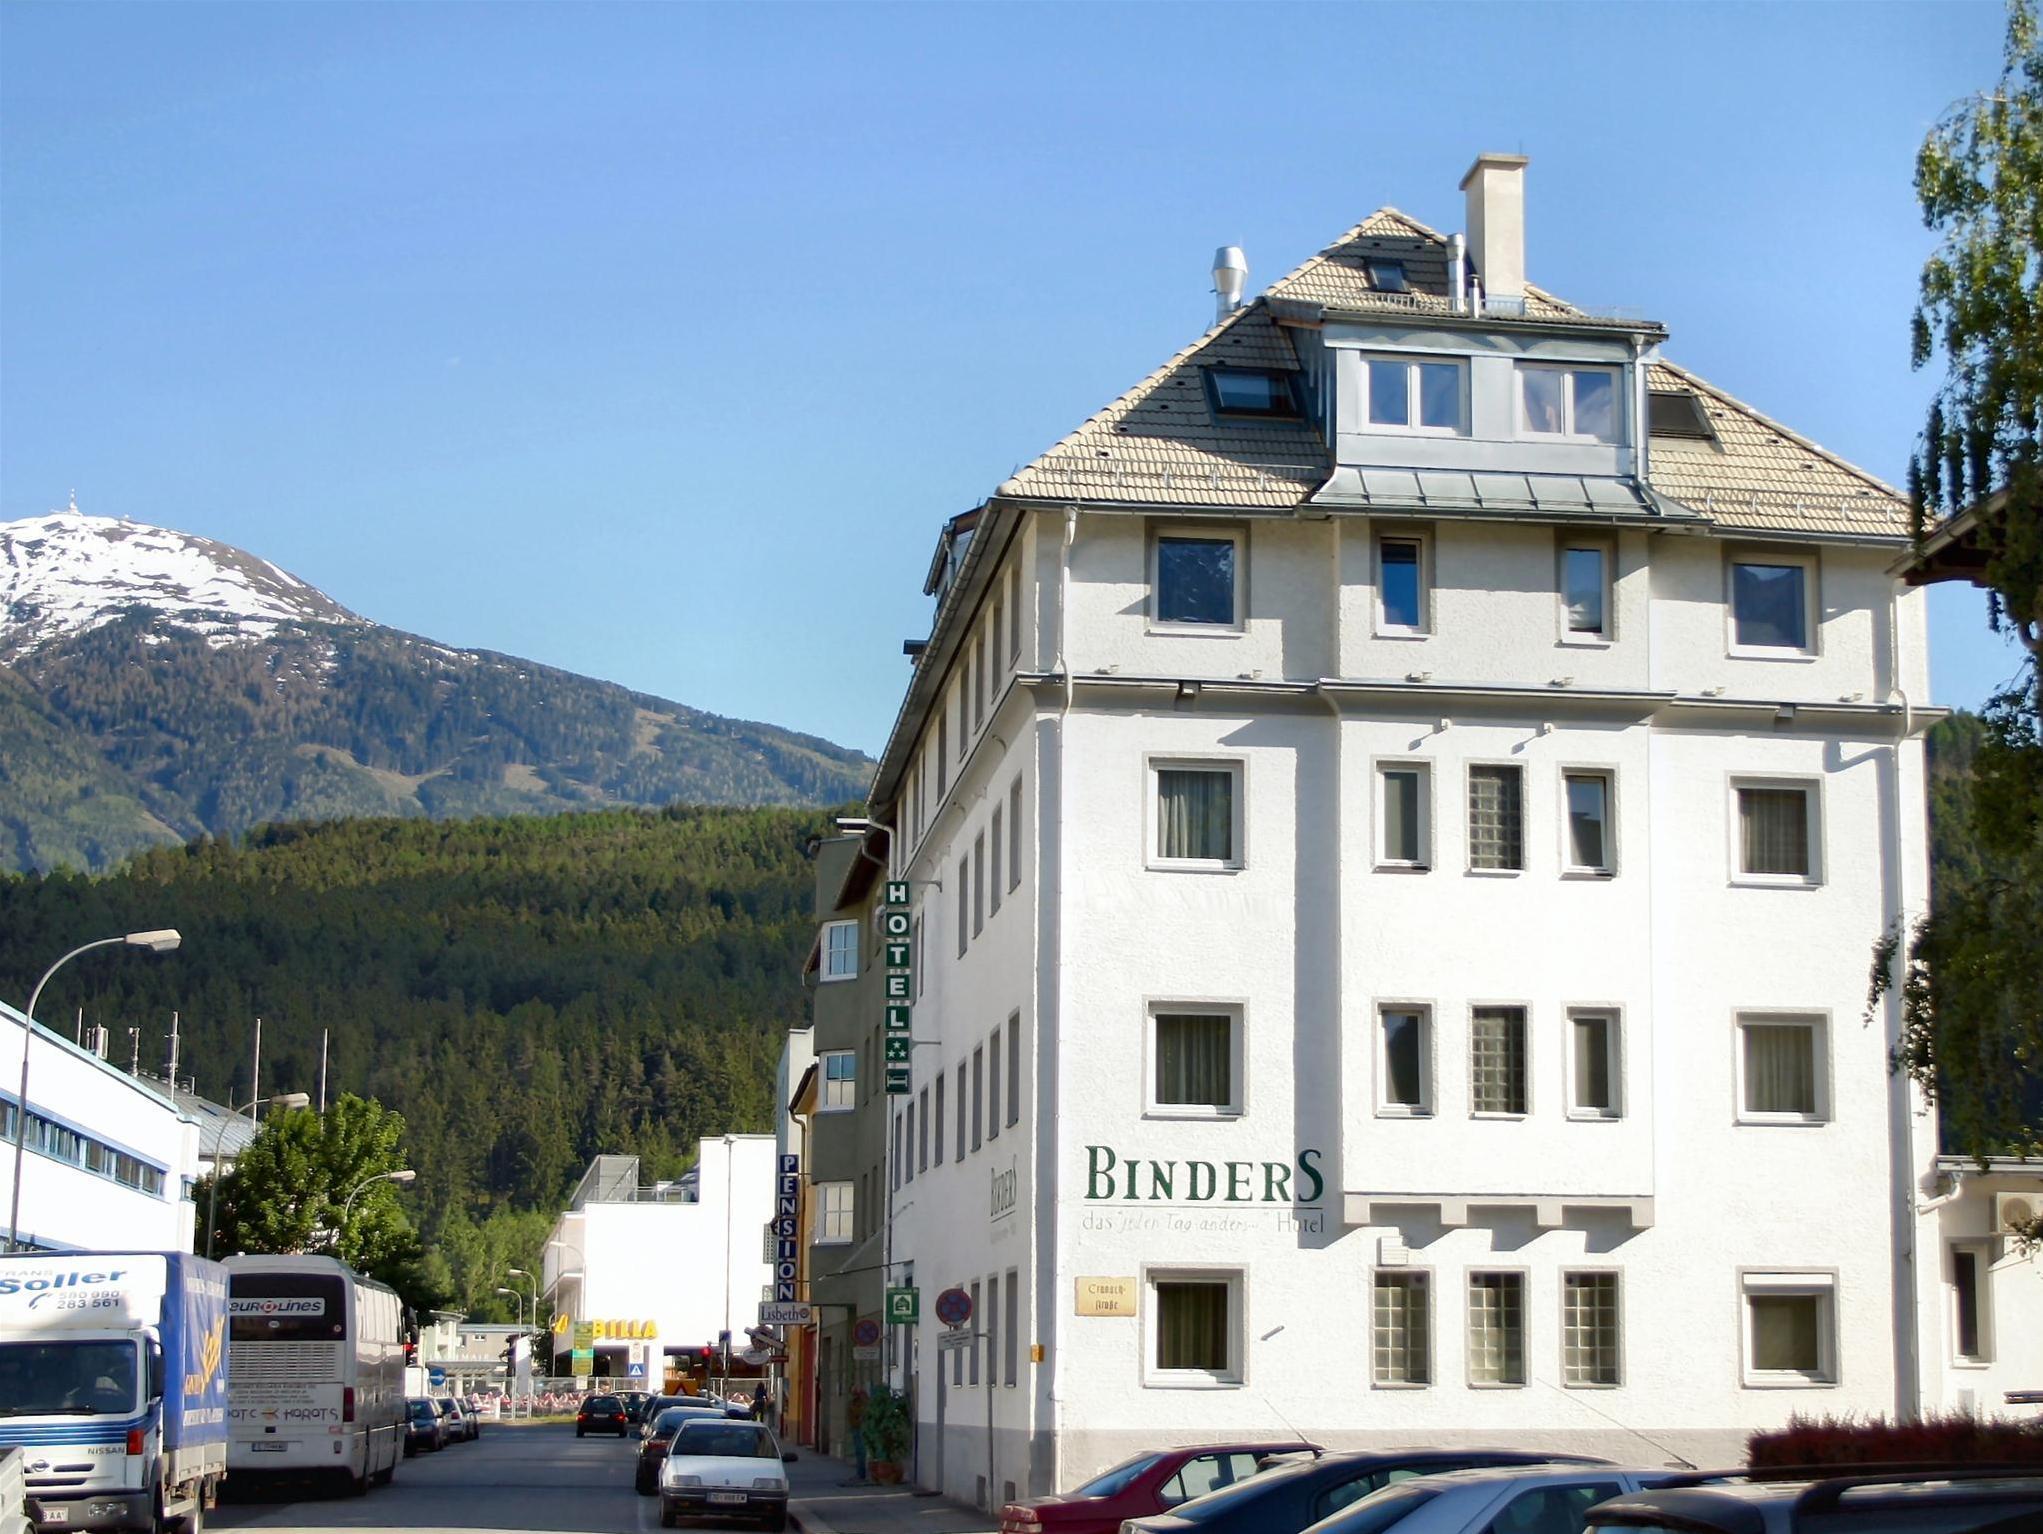 Binders Budget City-Mountain Hotel